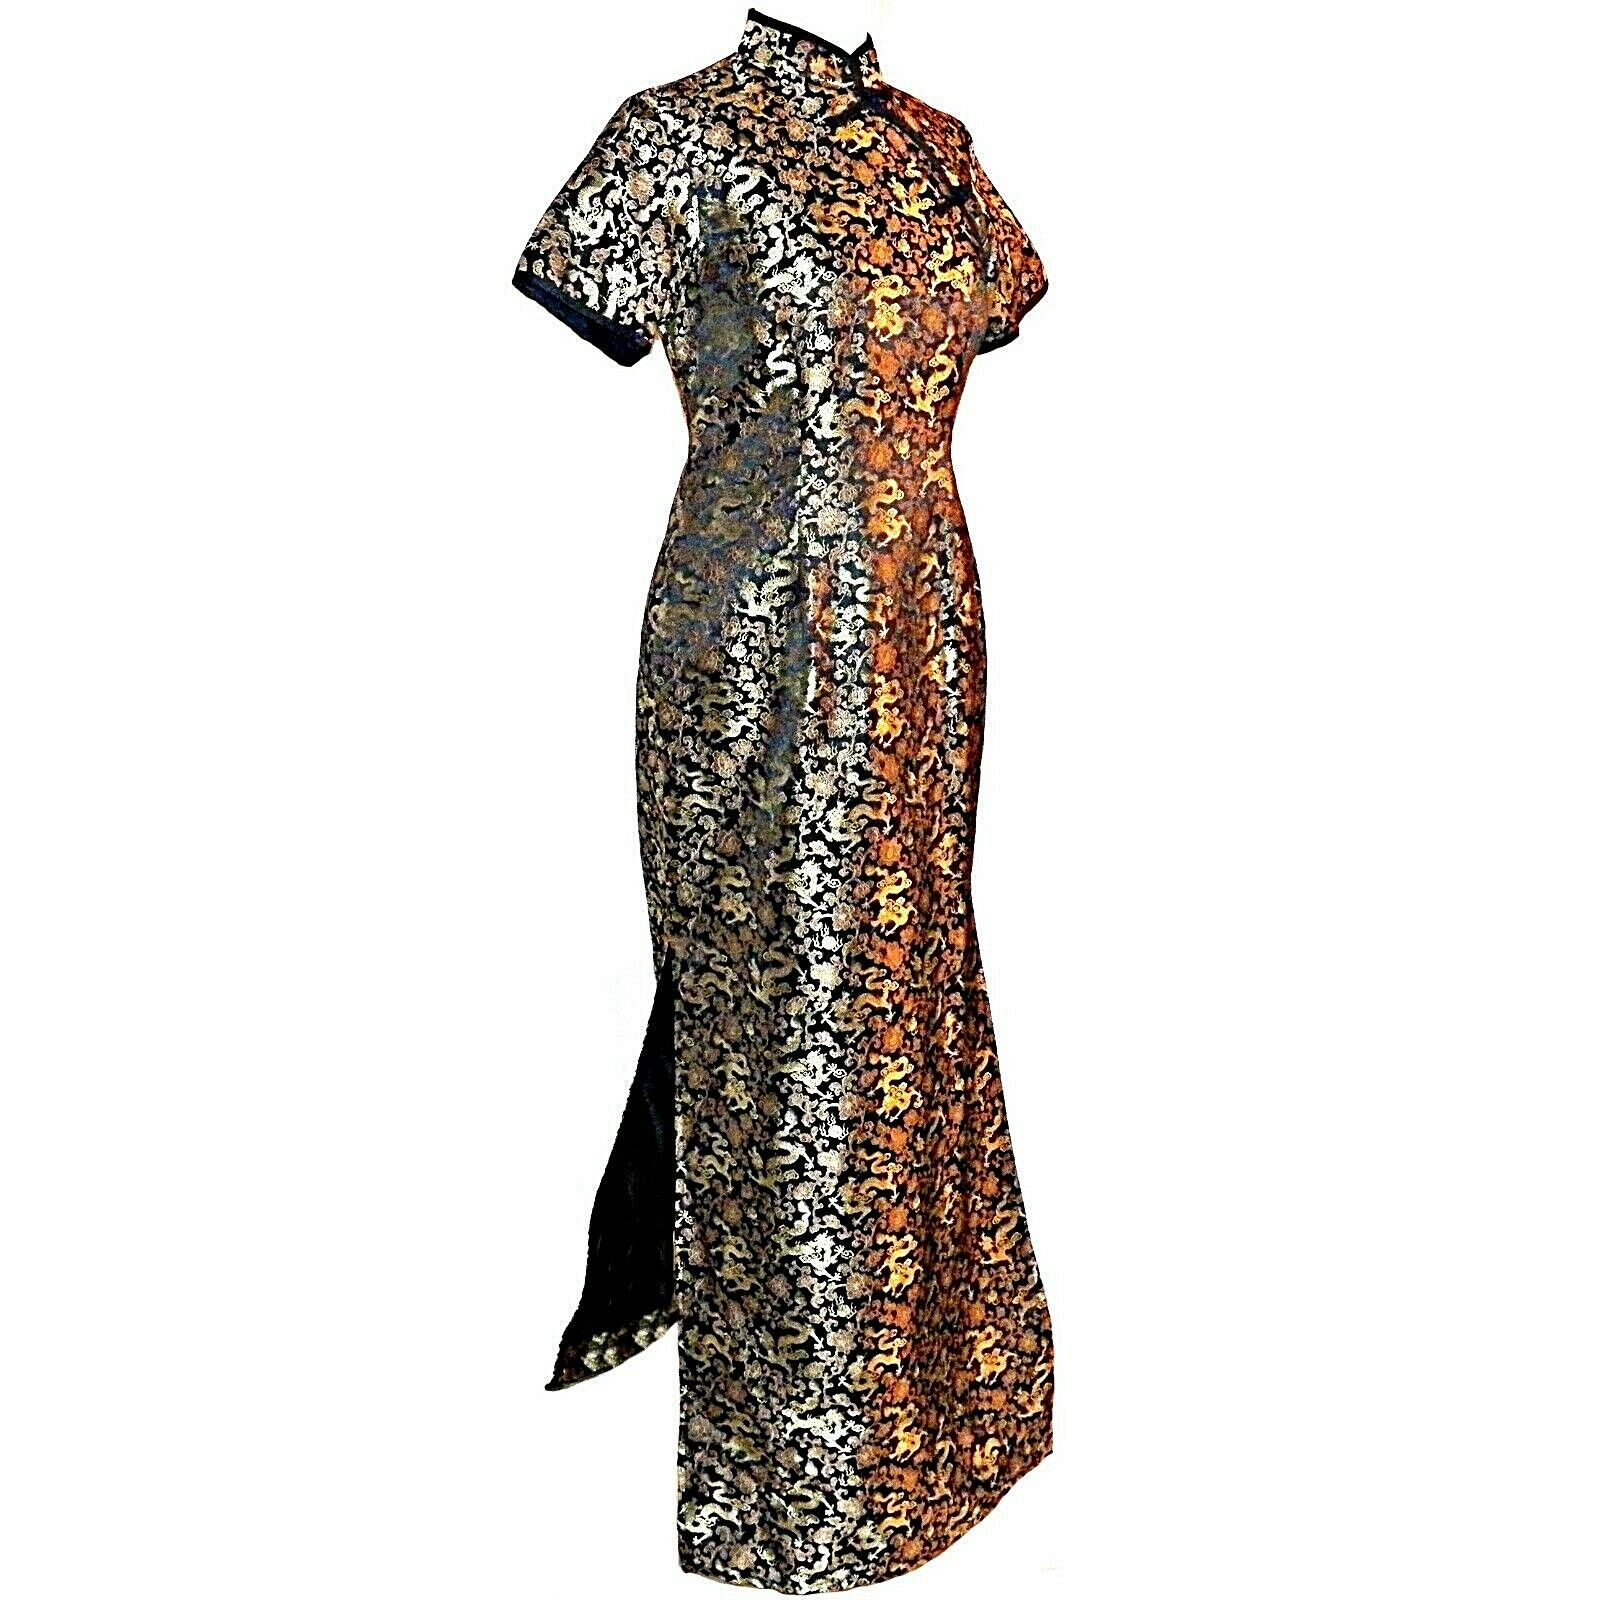 Custom Hoch Cheongsam Schwarz Gold Drachen Damen Qípáo Pin Up Maxi Kleid GRÖSSE